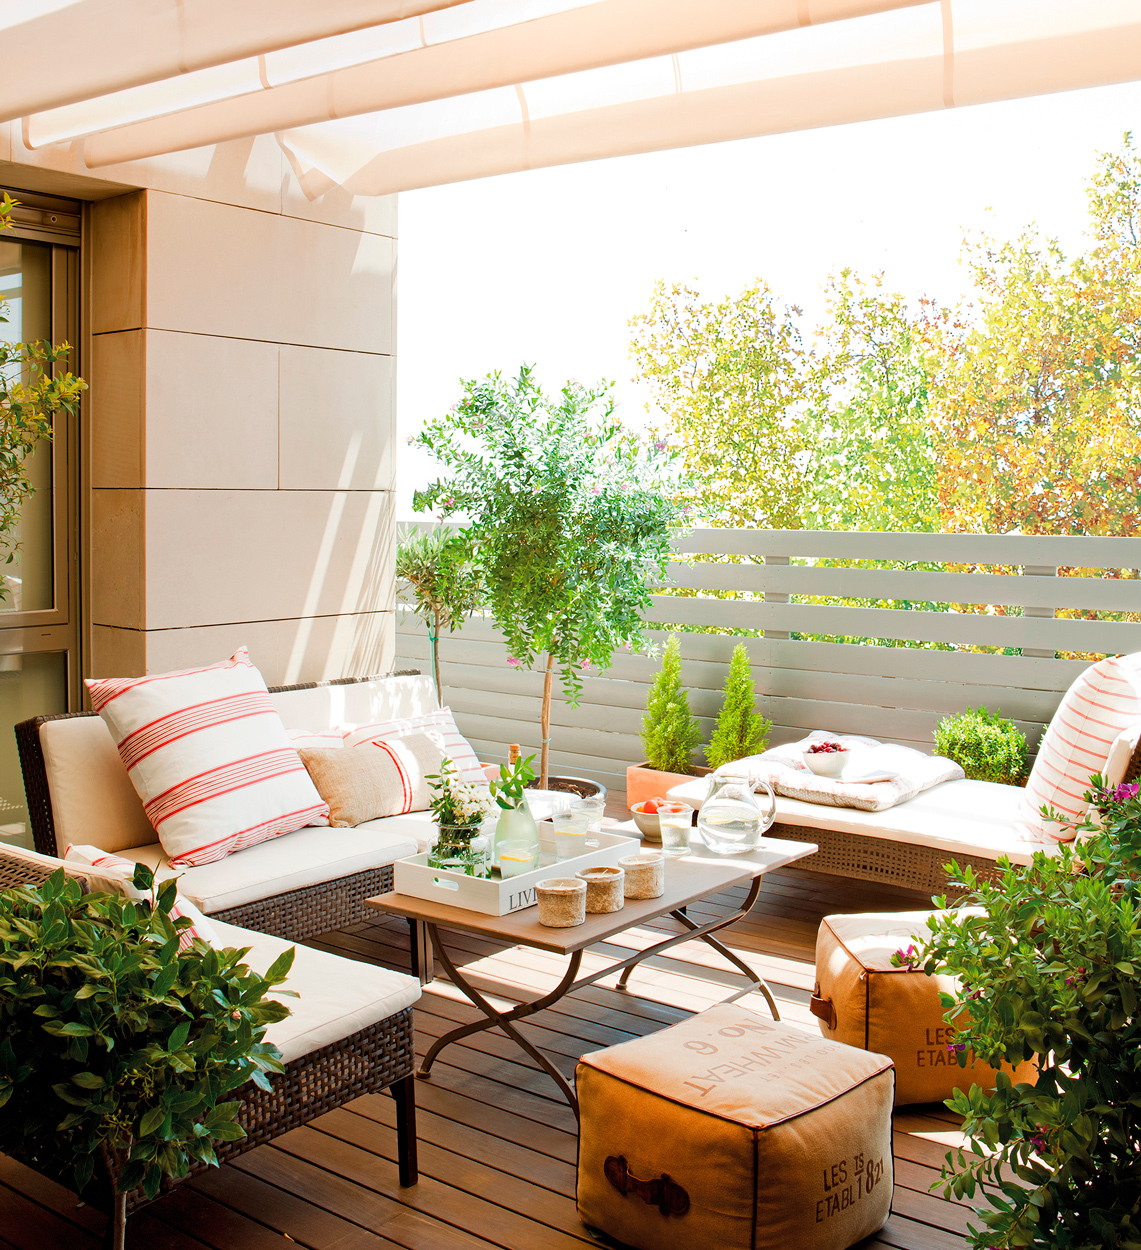 4 interiores conectados con la terraza - Mesas de terraza ...